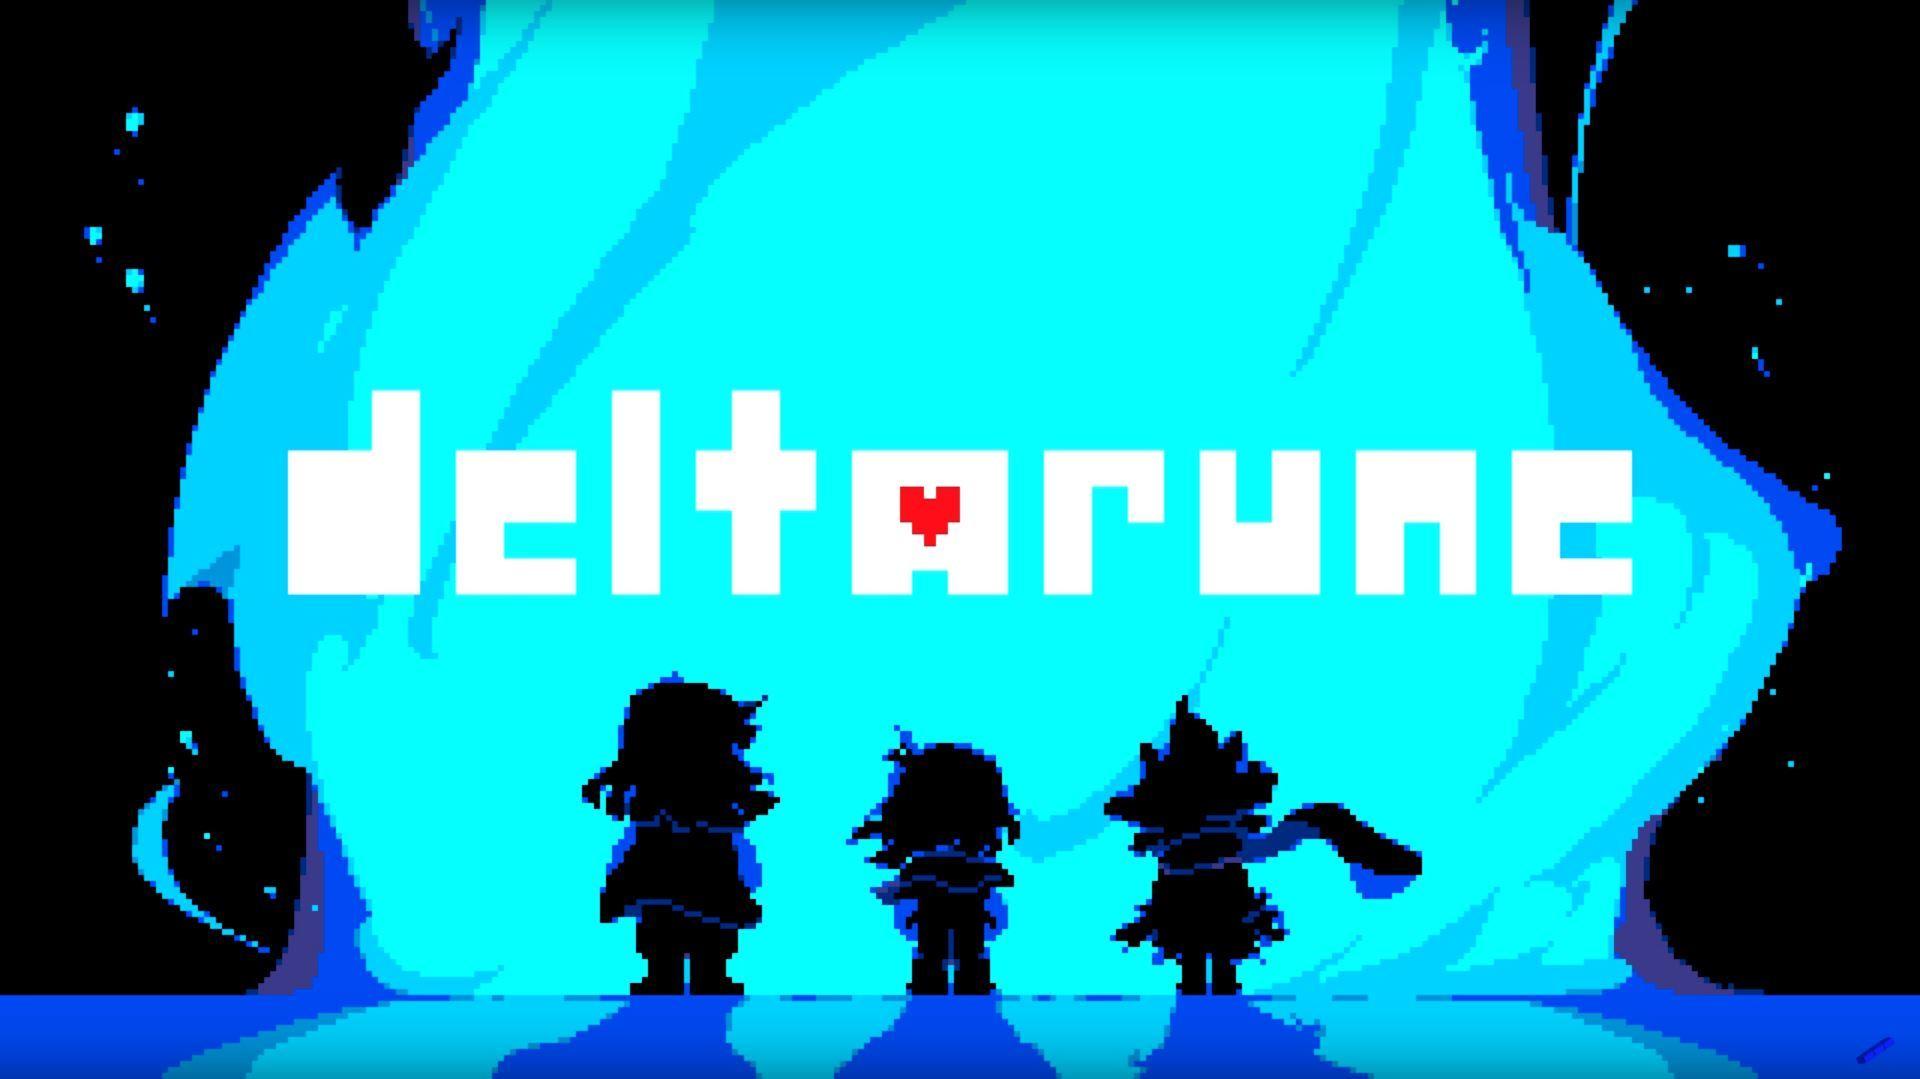 deltarune chapter 2 release date